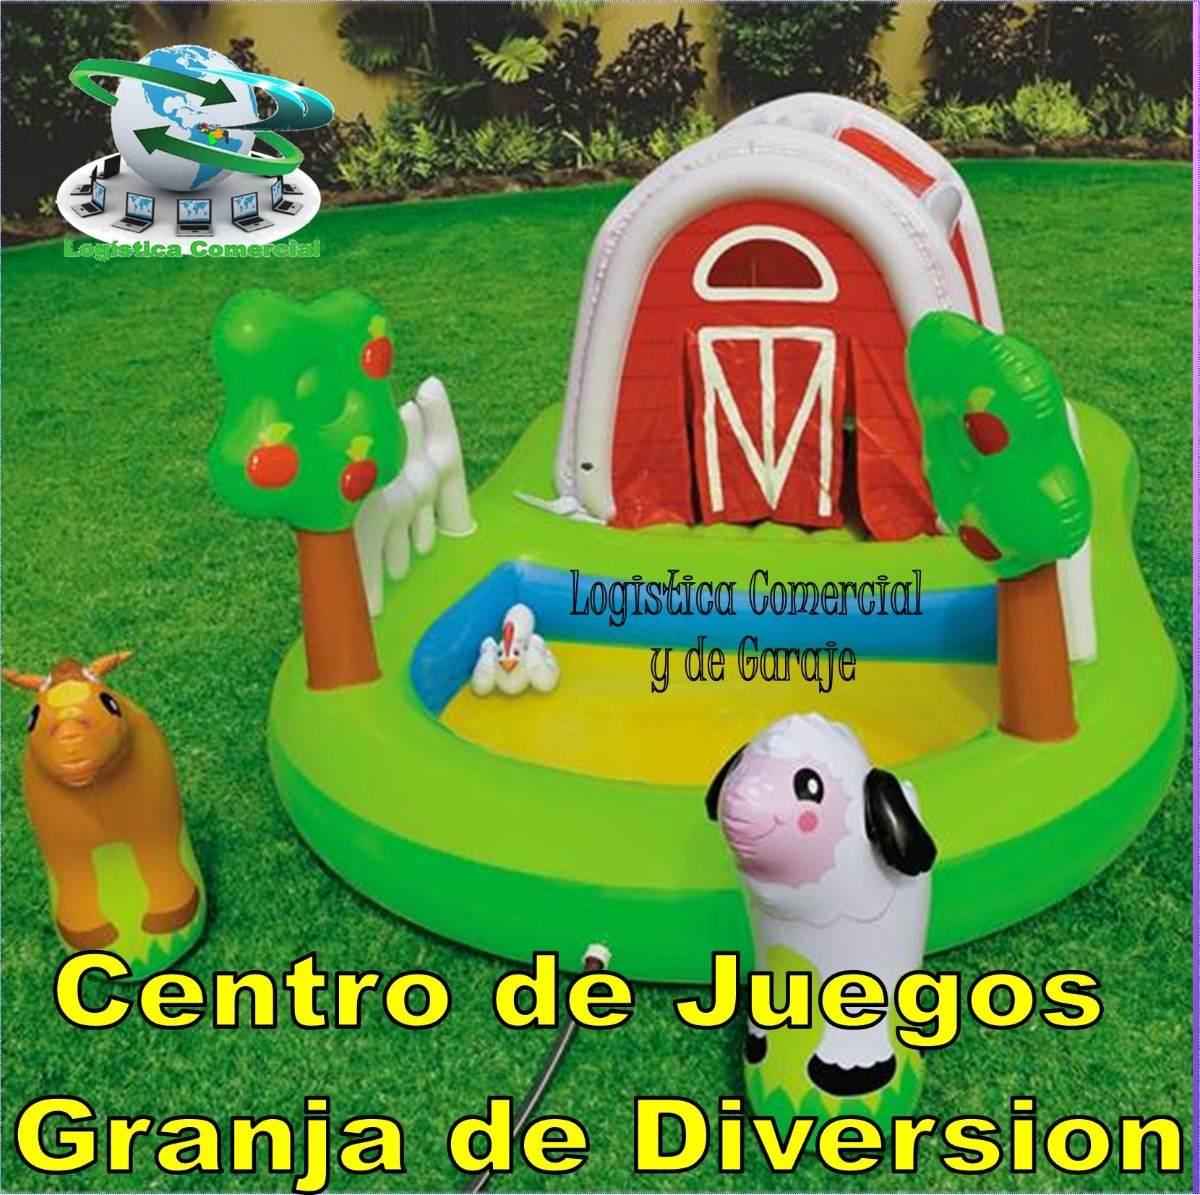 Piscina inflable centro juego accesorios granja intex 57455 bs 7 95 en mercado libre - Panales para piscina ...